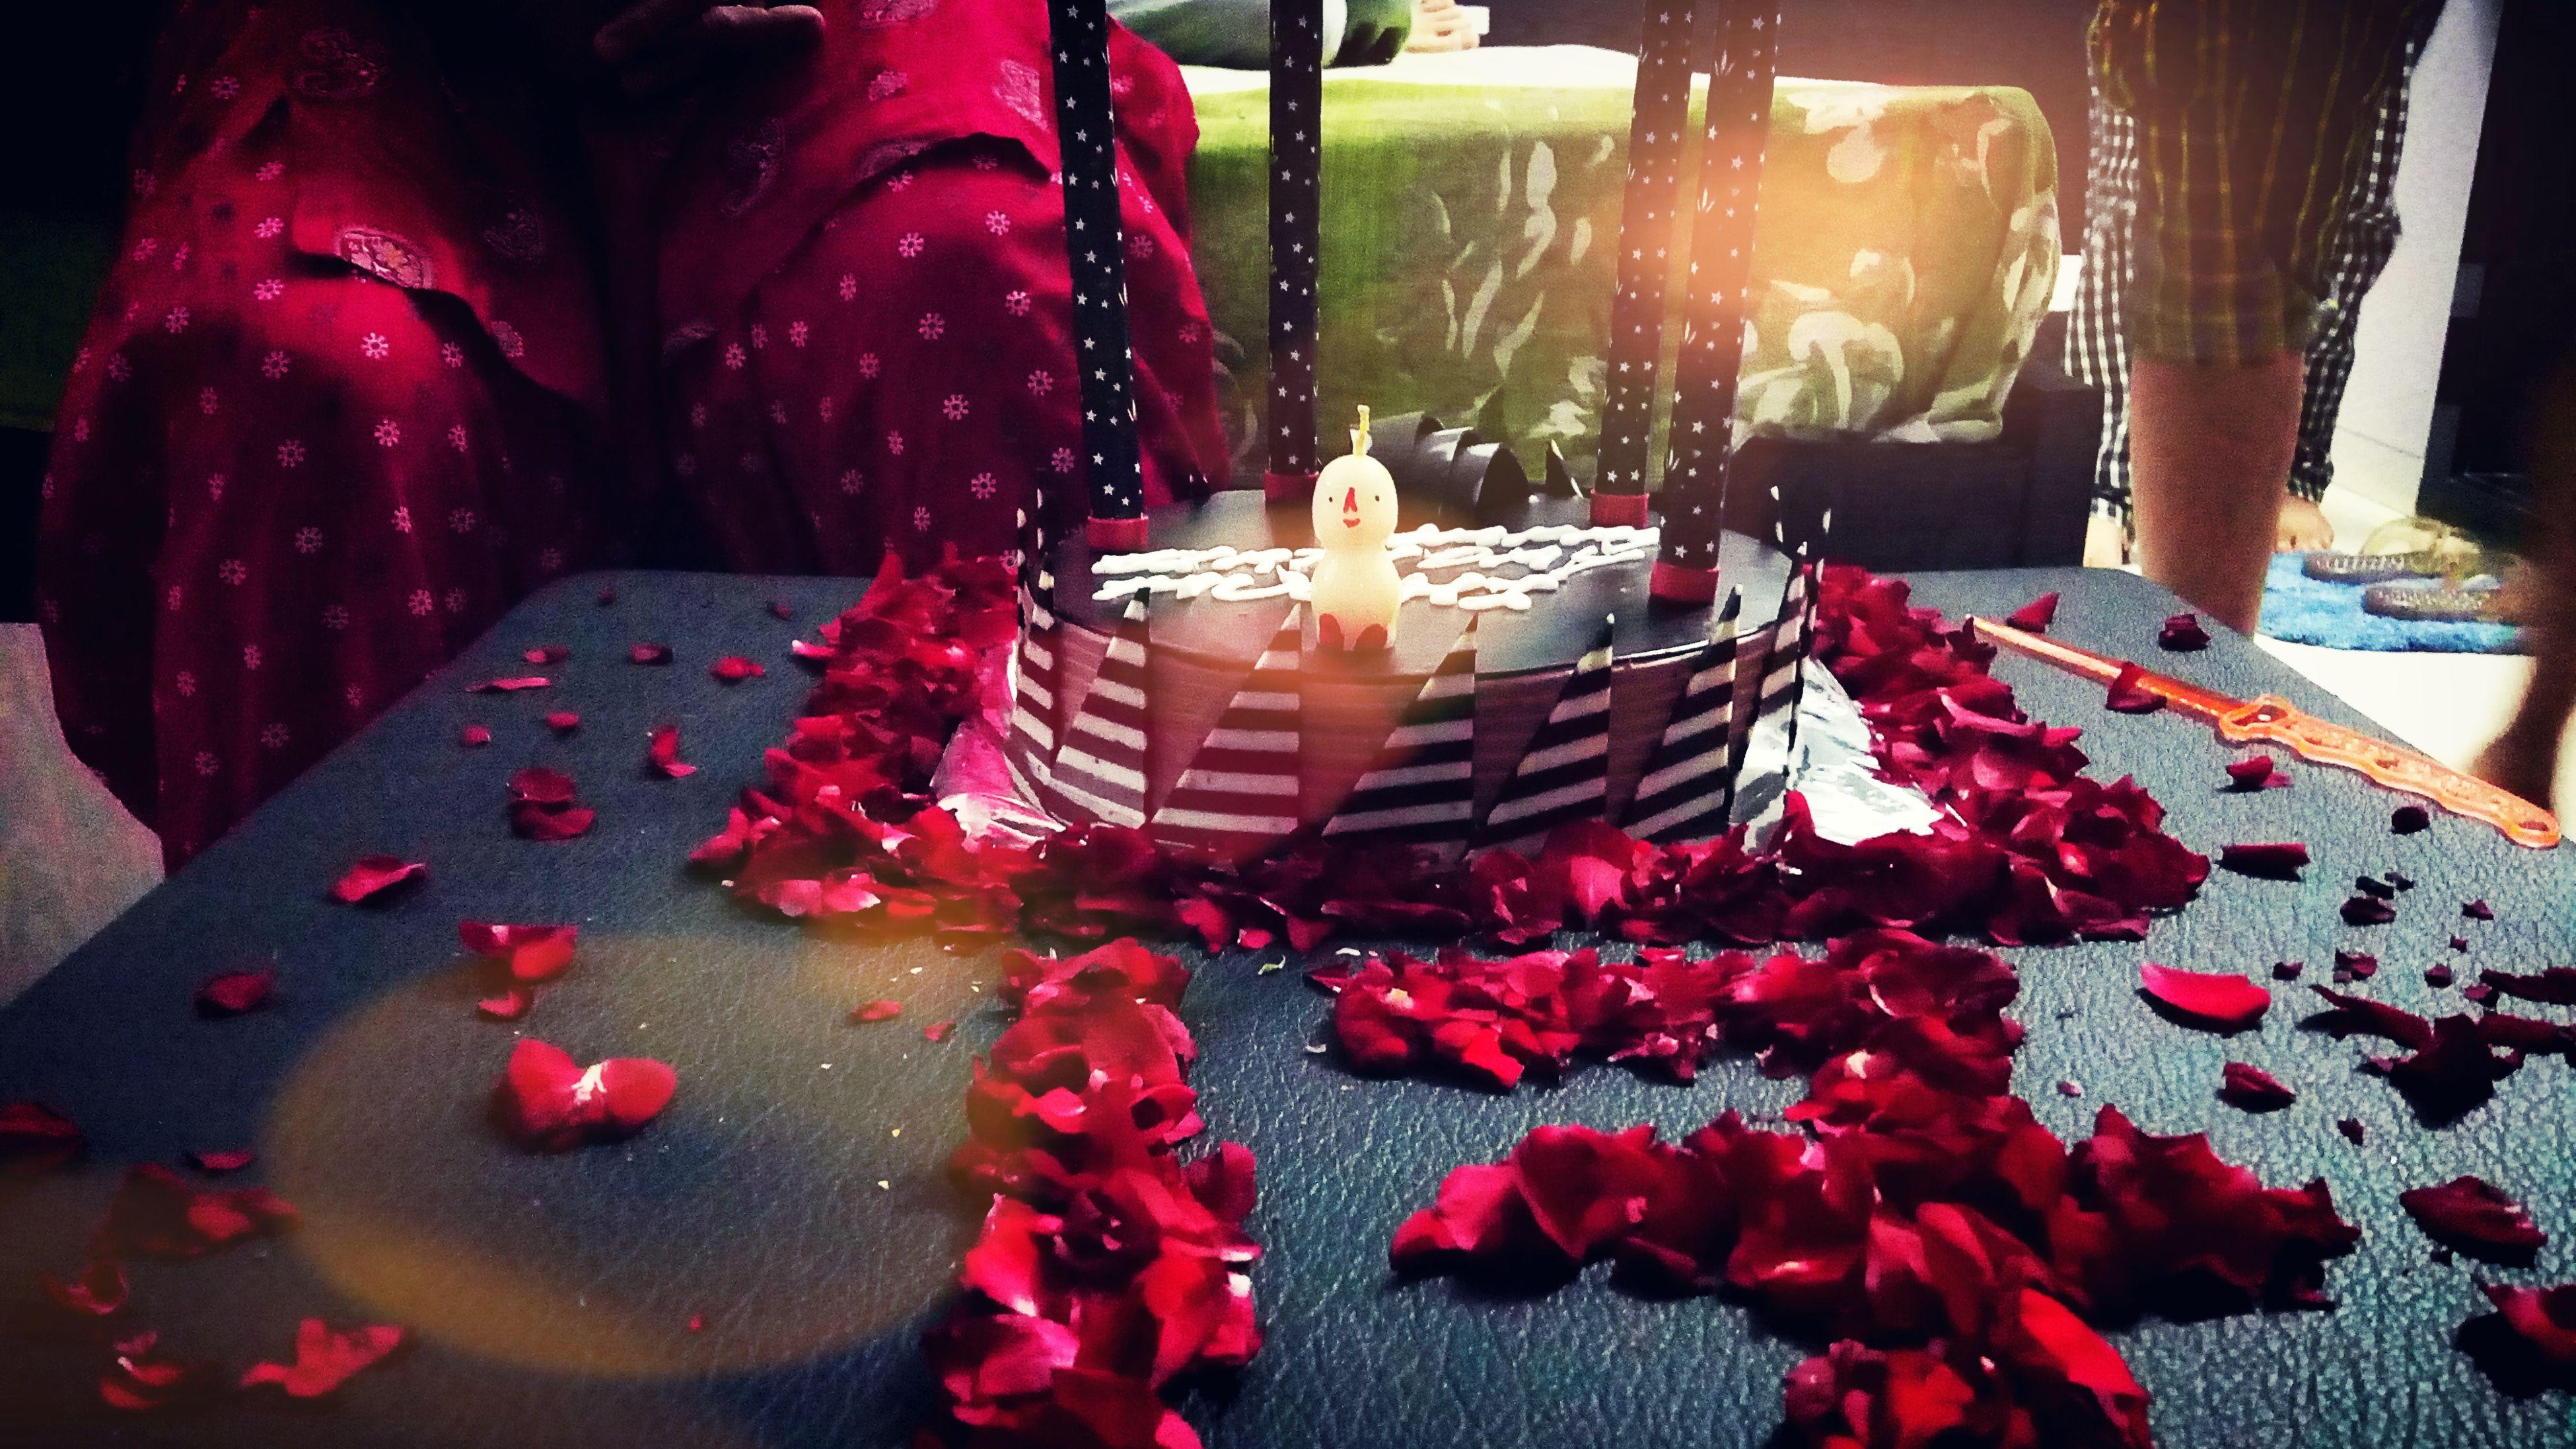 Ribbons&Balloons Birthdaycake SatraPeKhatra